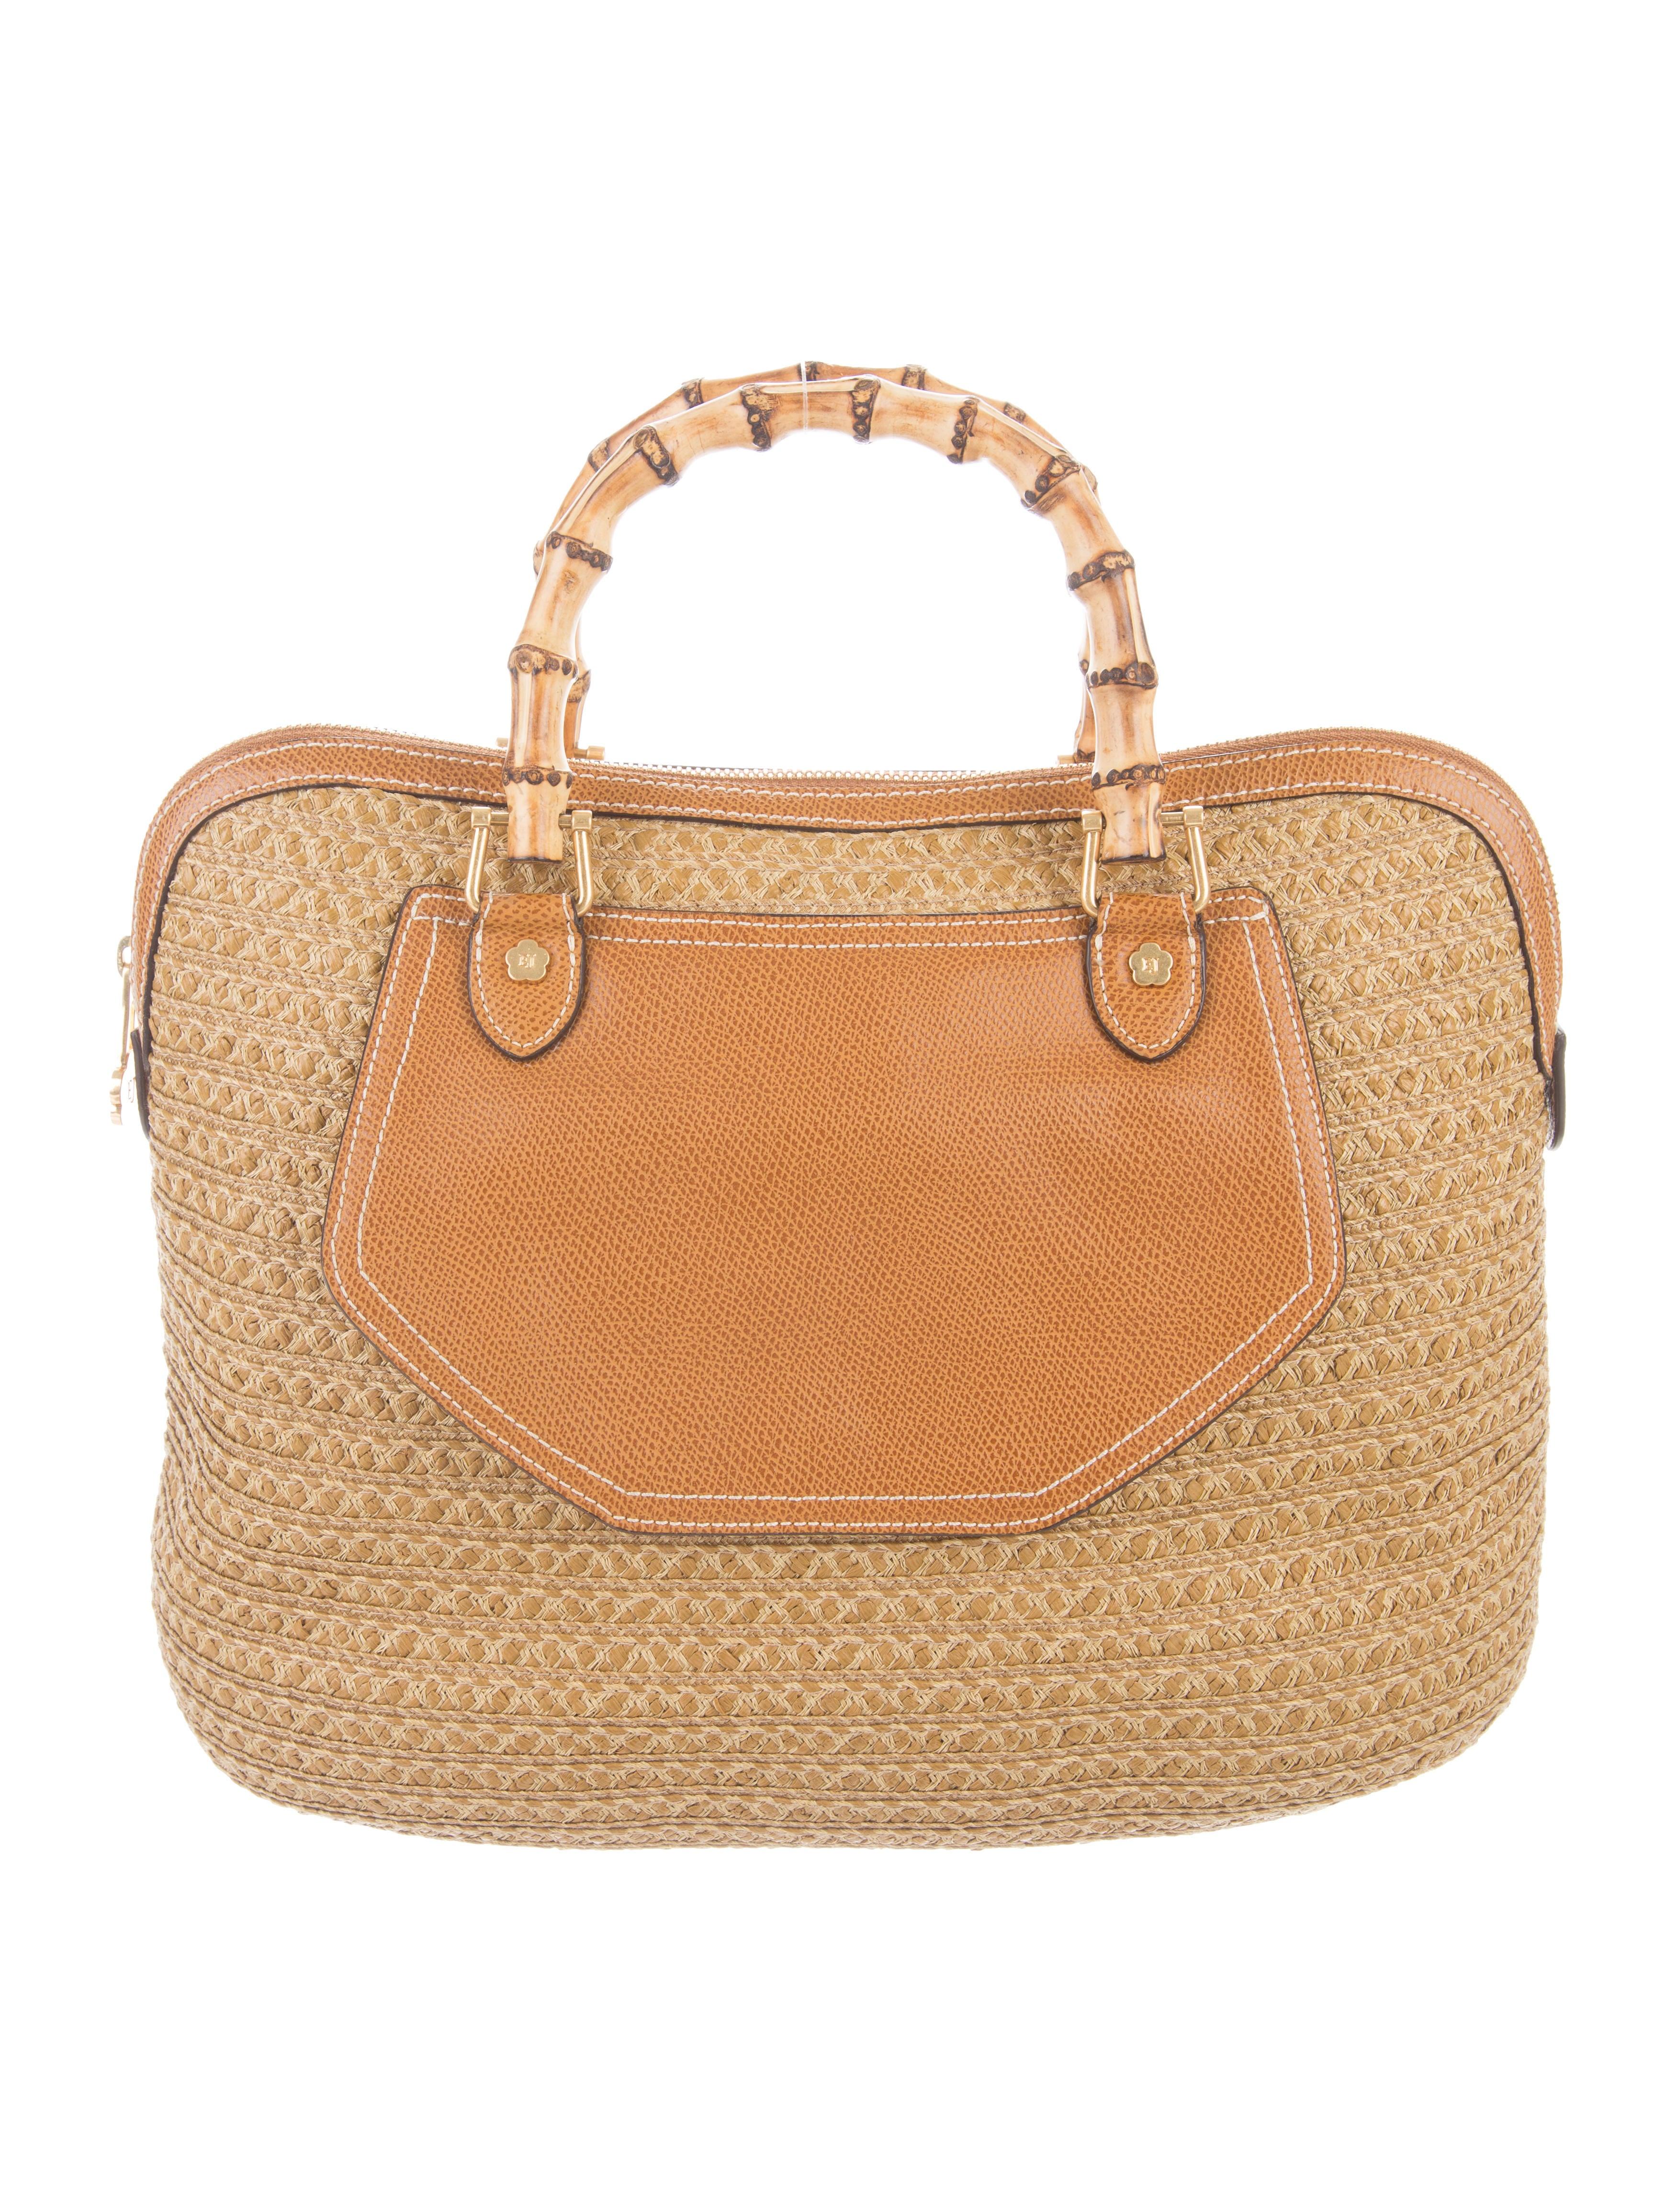 c6cb0882f2f9 Eric Javits Squishee Bamboo Tote - Handbags - WEJ21134 | The RealReal